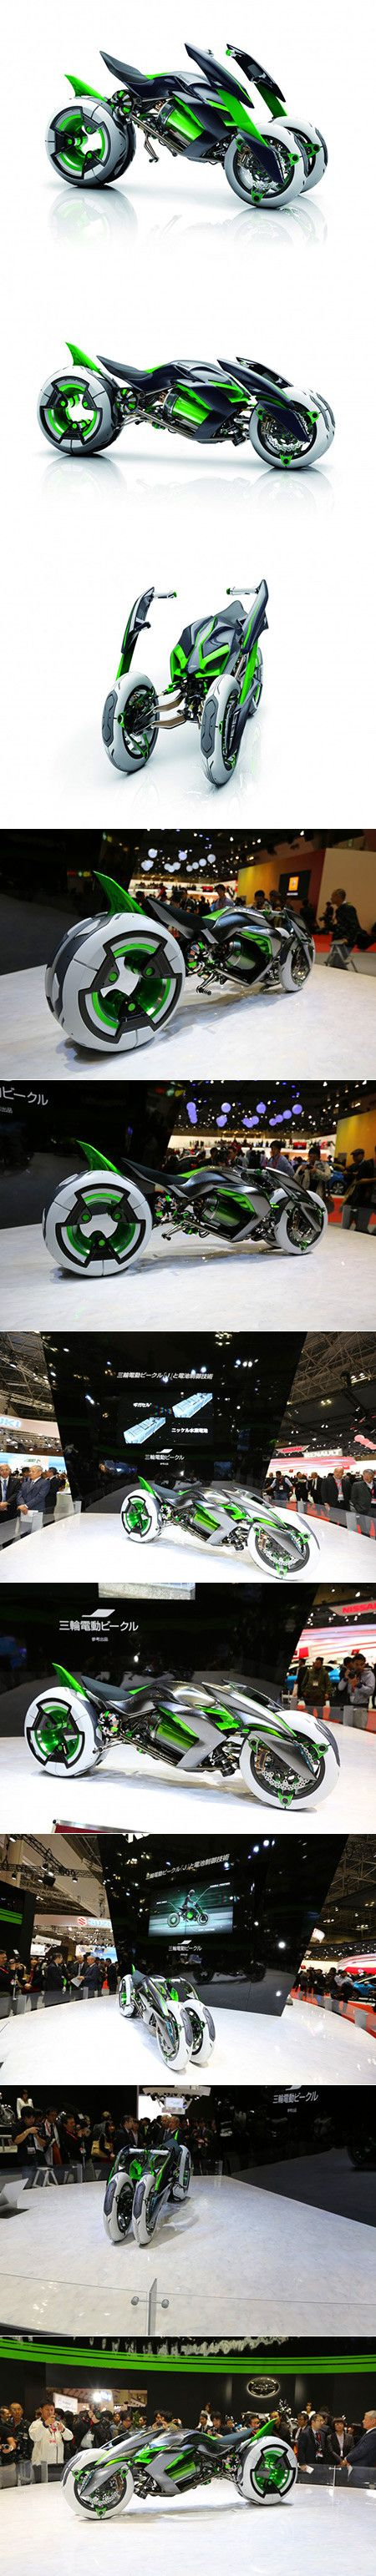 Kawasaki J is a Real-Life TRON Light Cycle, Features Shape Shifting 3-Wheel Design - #motorcycles